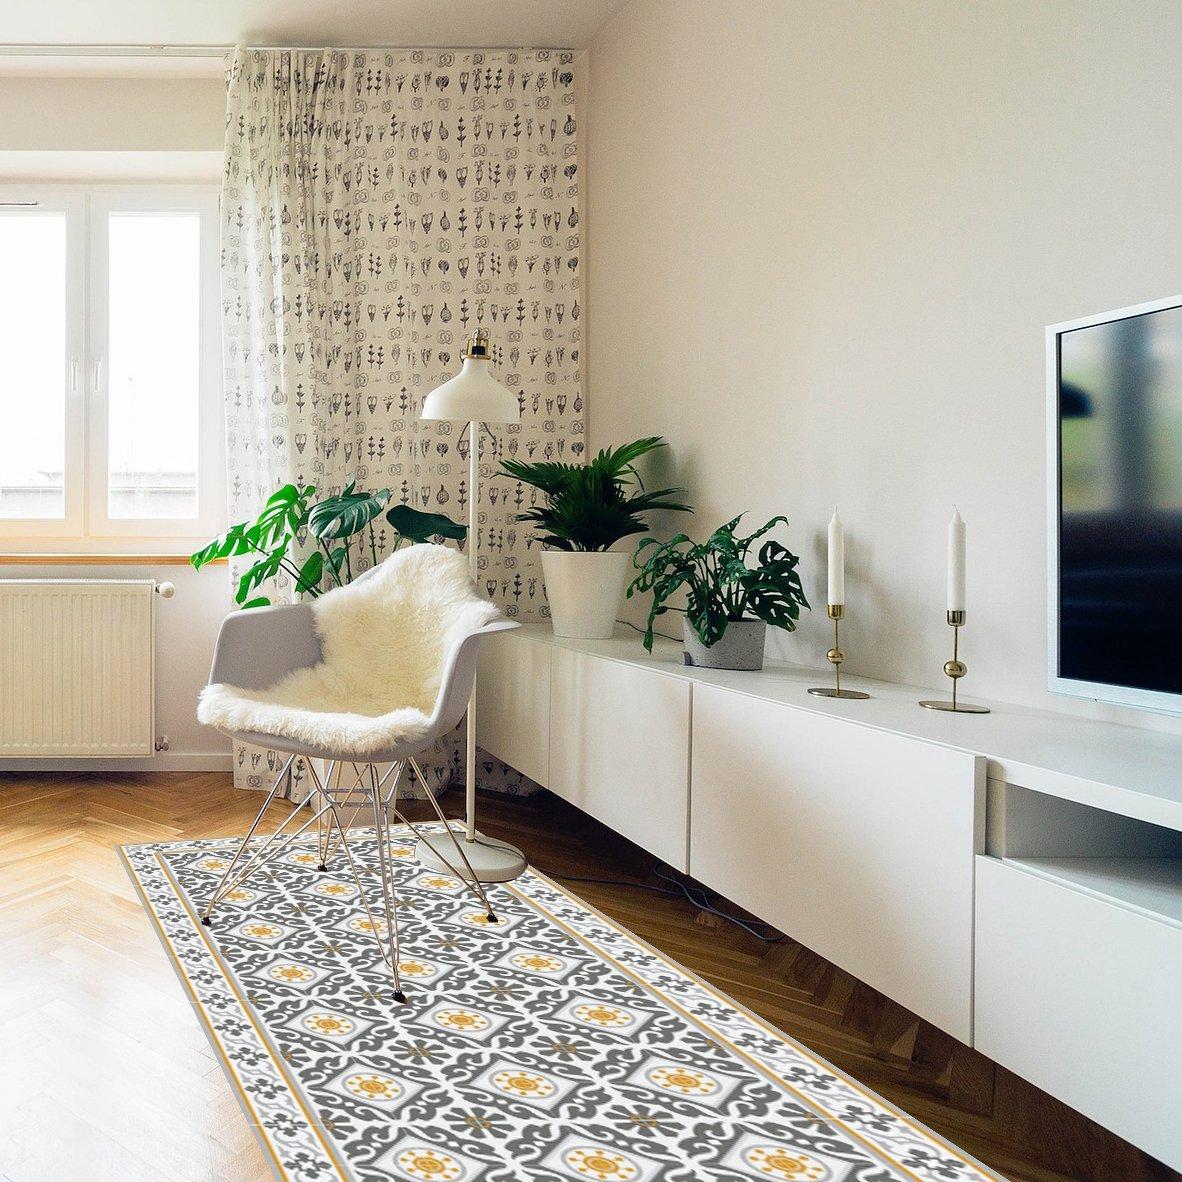 Gray & Yellow Kitchen vinyl mat Carpet Tiles Pattern Decorative linoleum rug 214